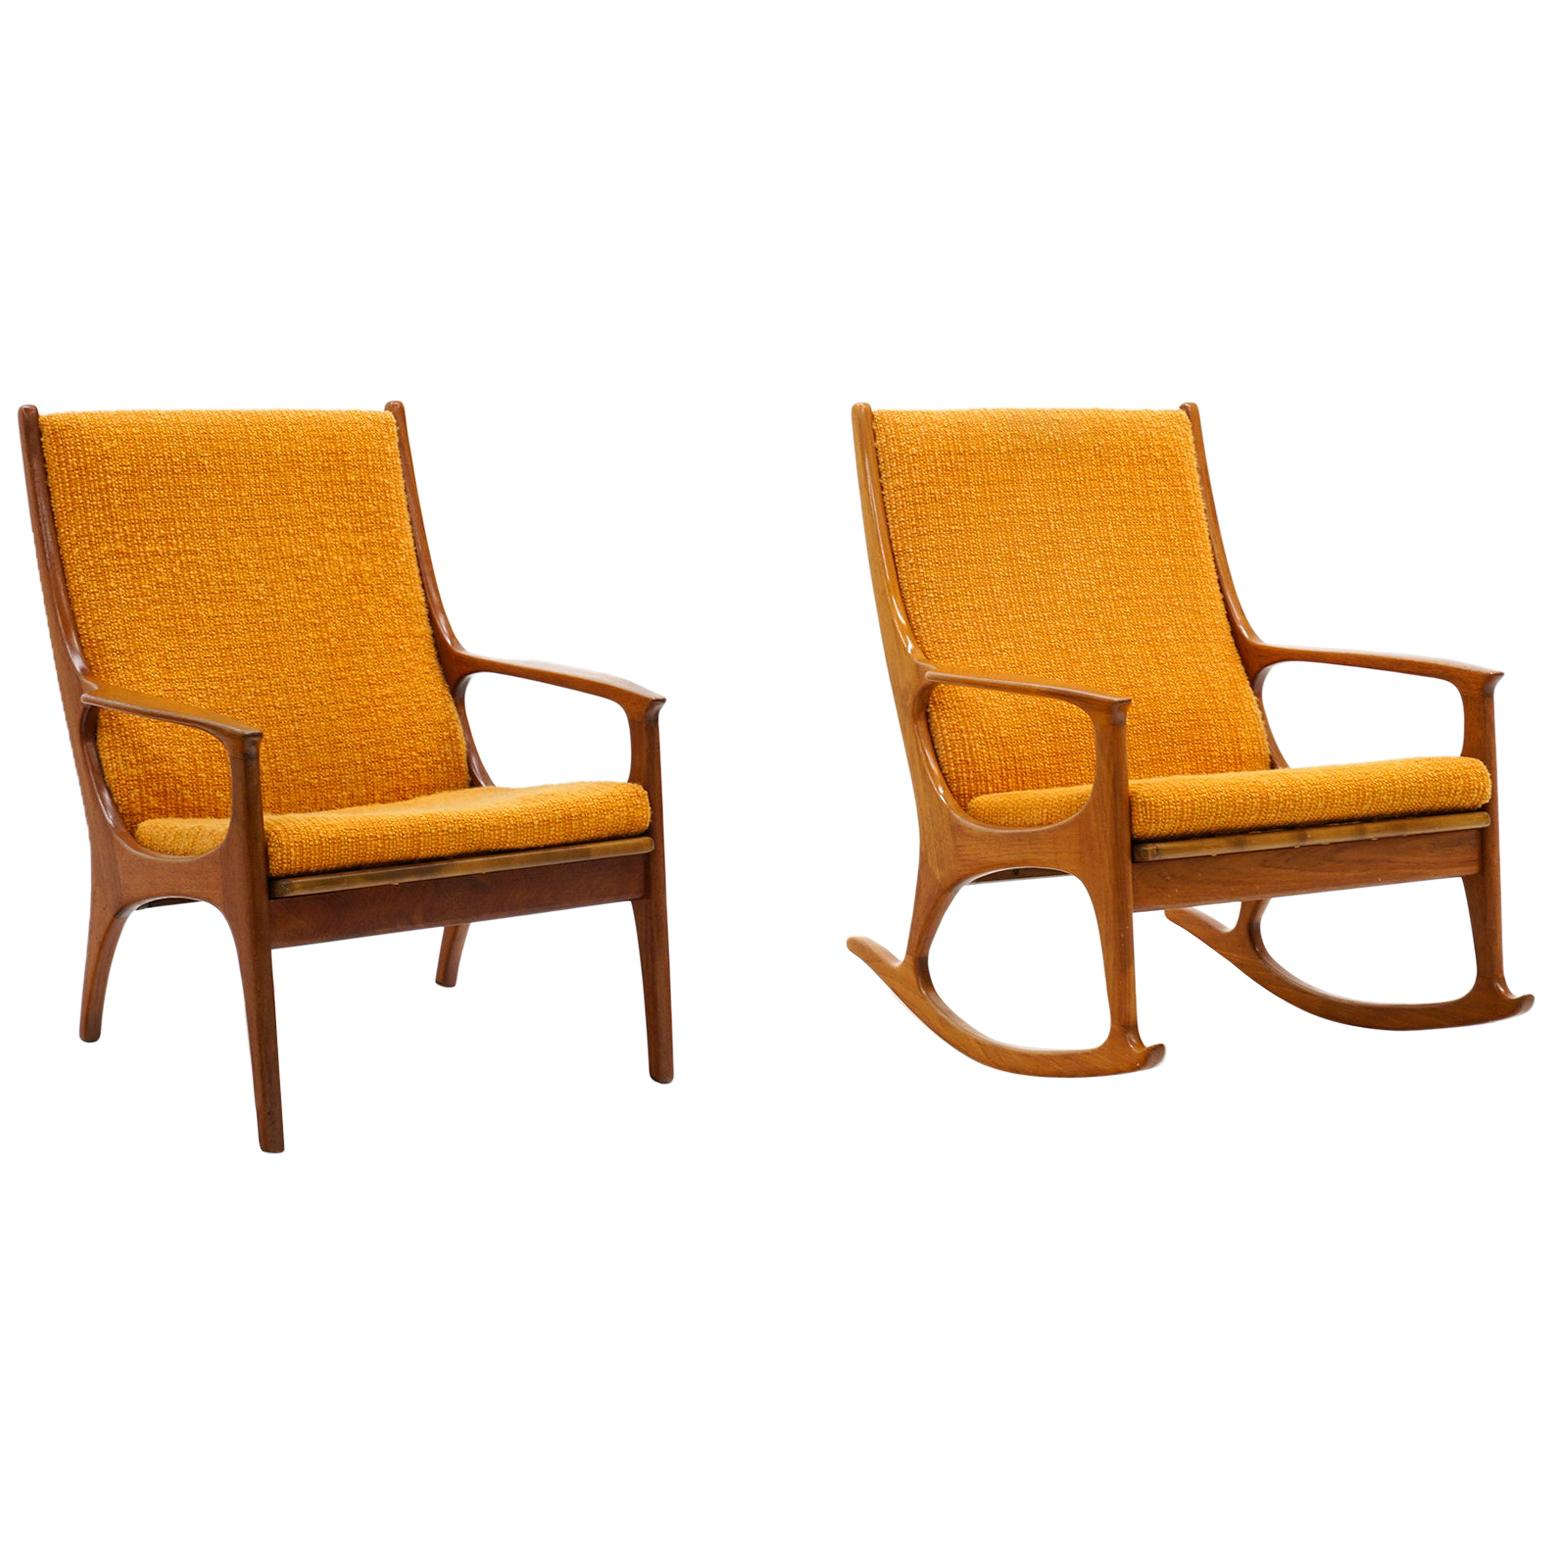 Pair of Danish Modern High Back Lounge Chairs, One Rocker, Teak Orange Originall